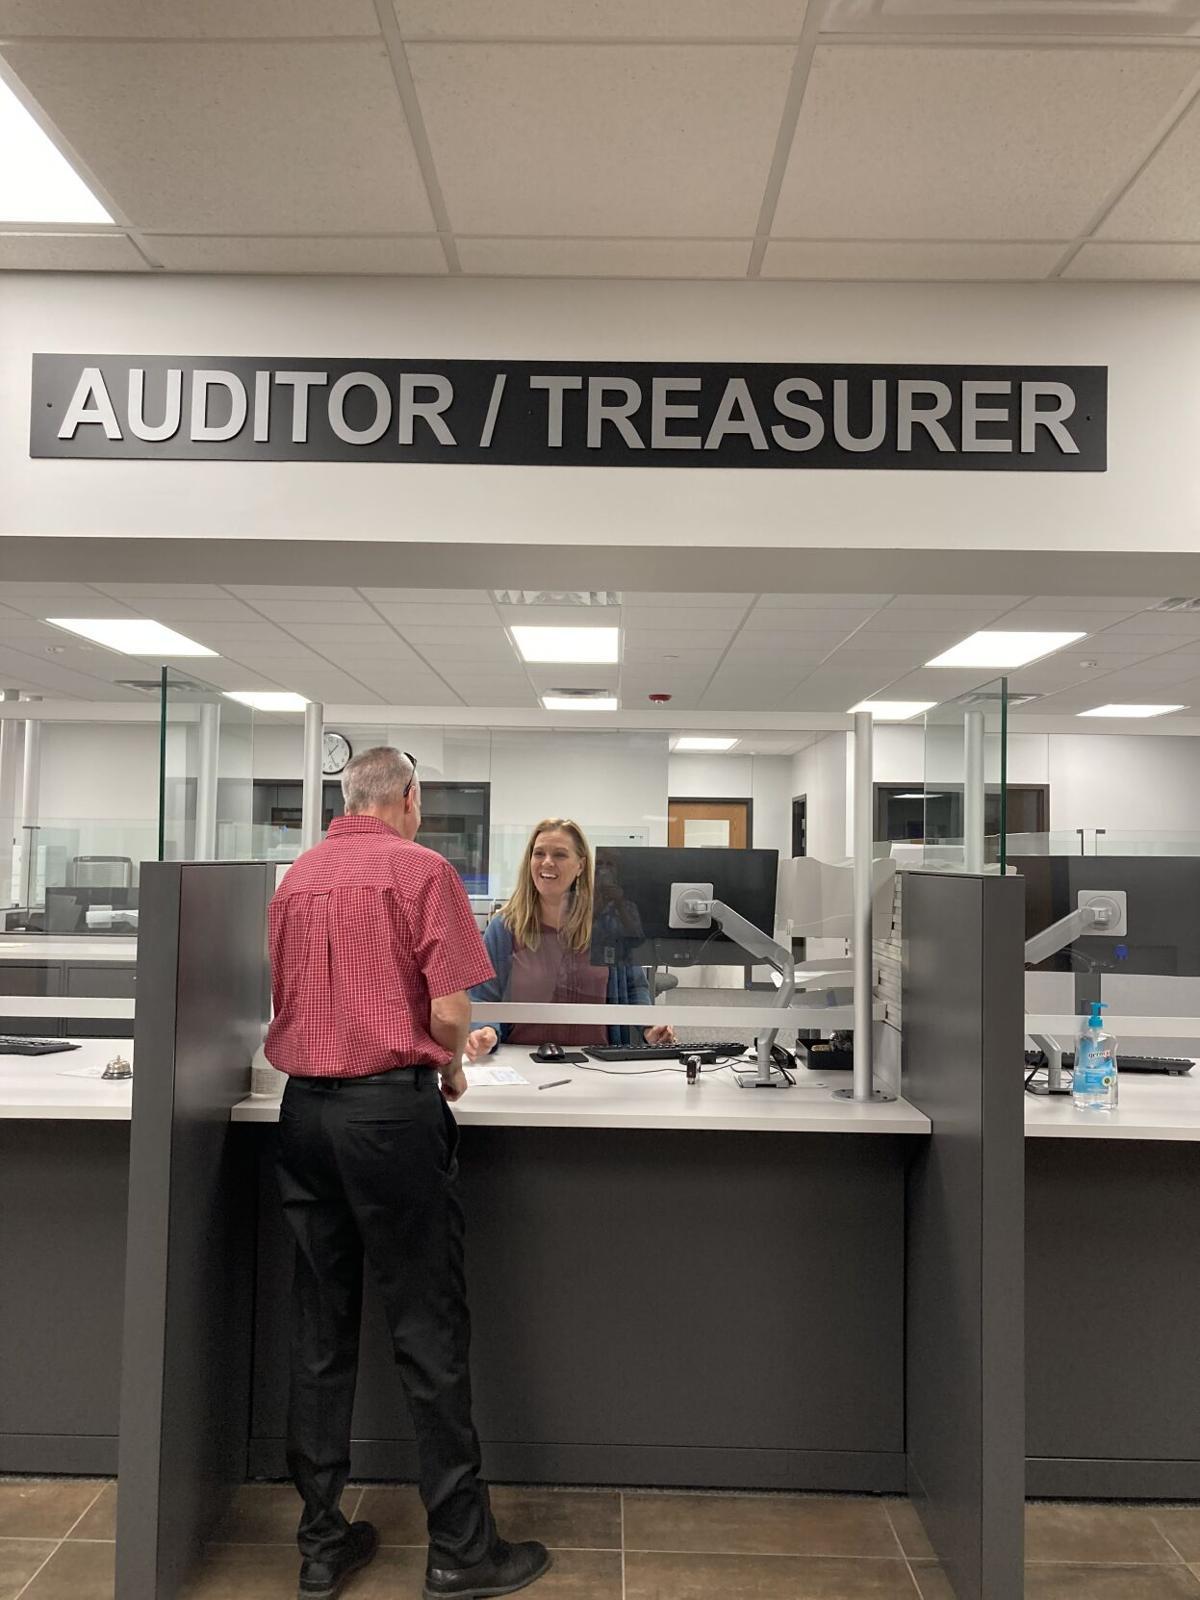 New Douglas County Auditor Treasurer Office